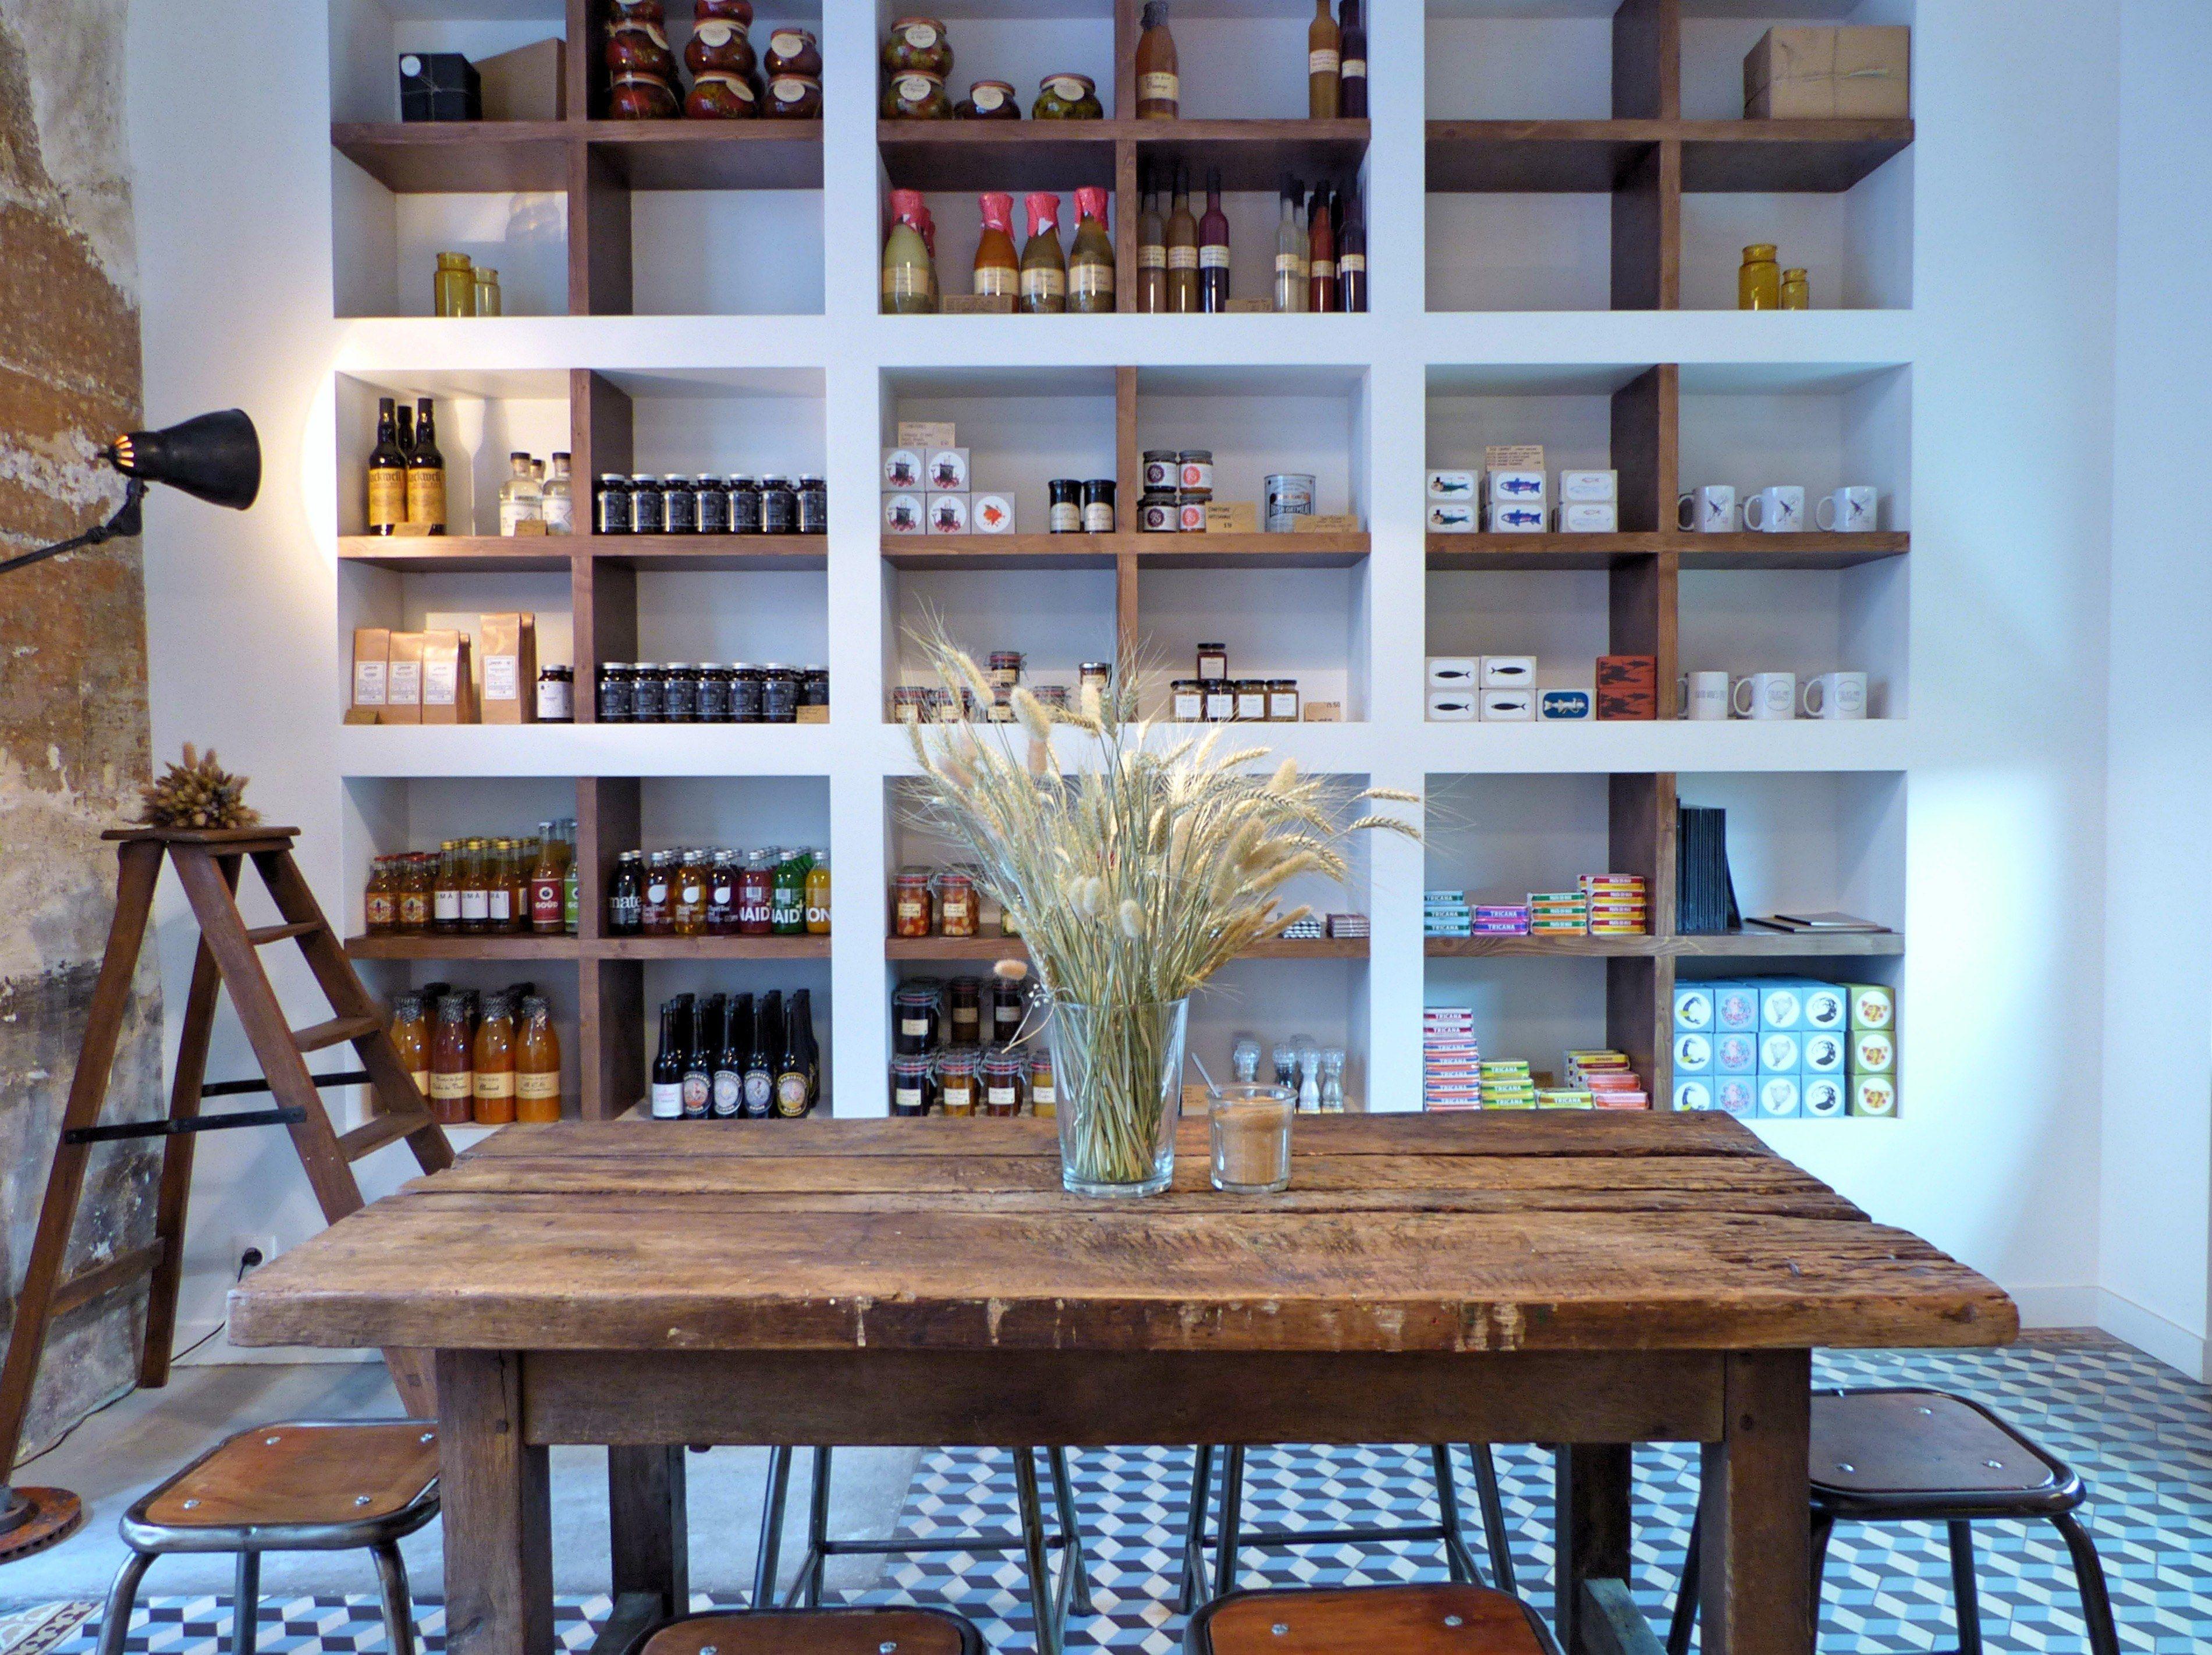 The 6 Top Coffee Bars in Paris for Beautiful Design | Interiors ...